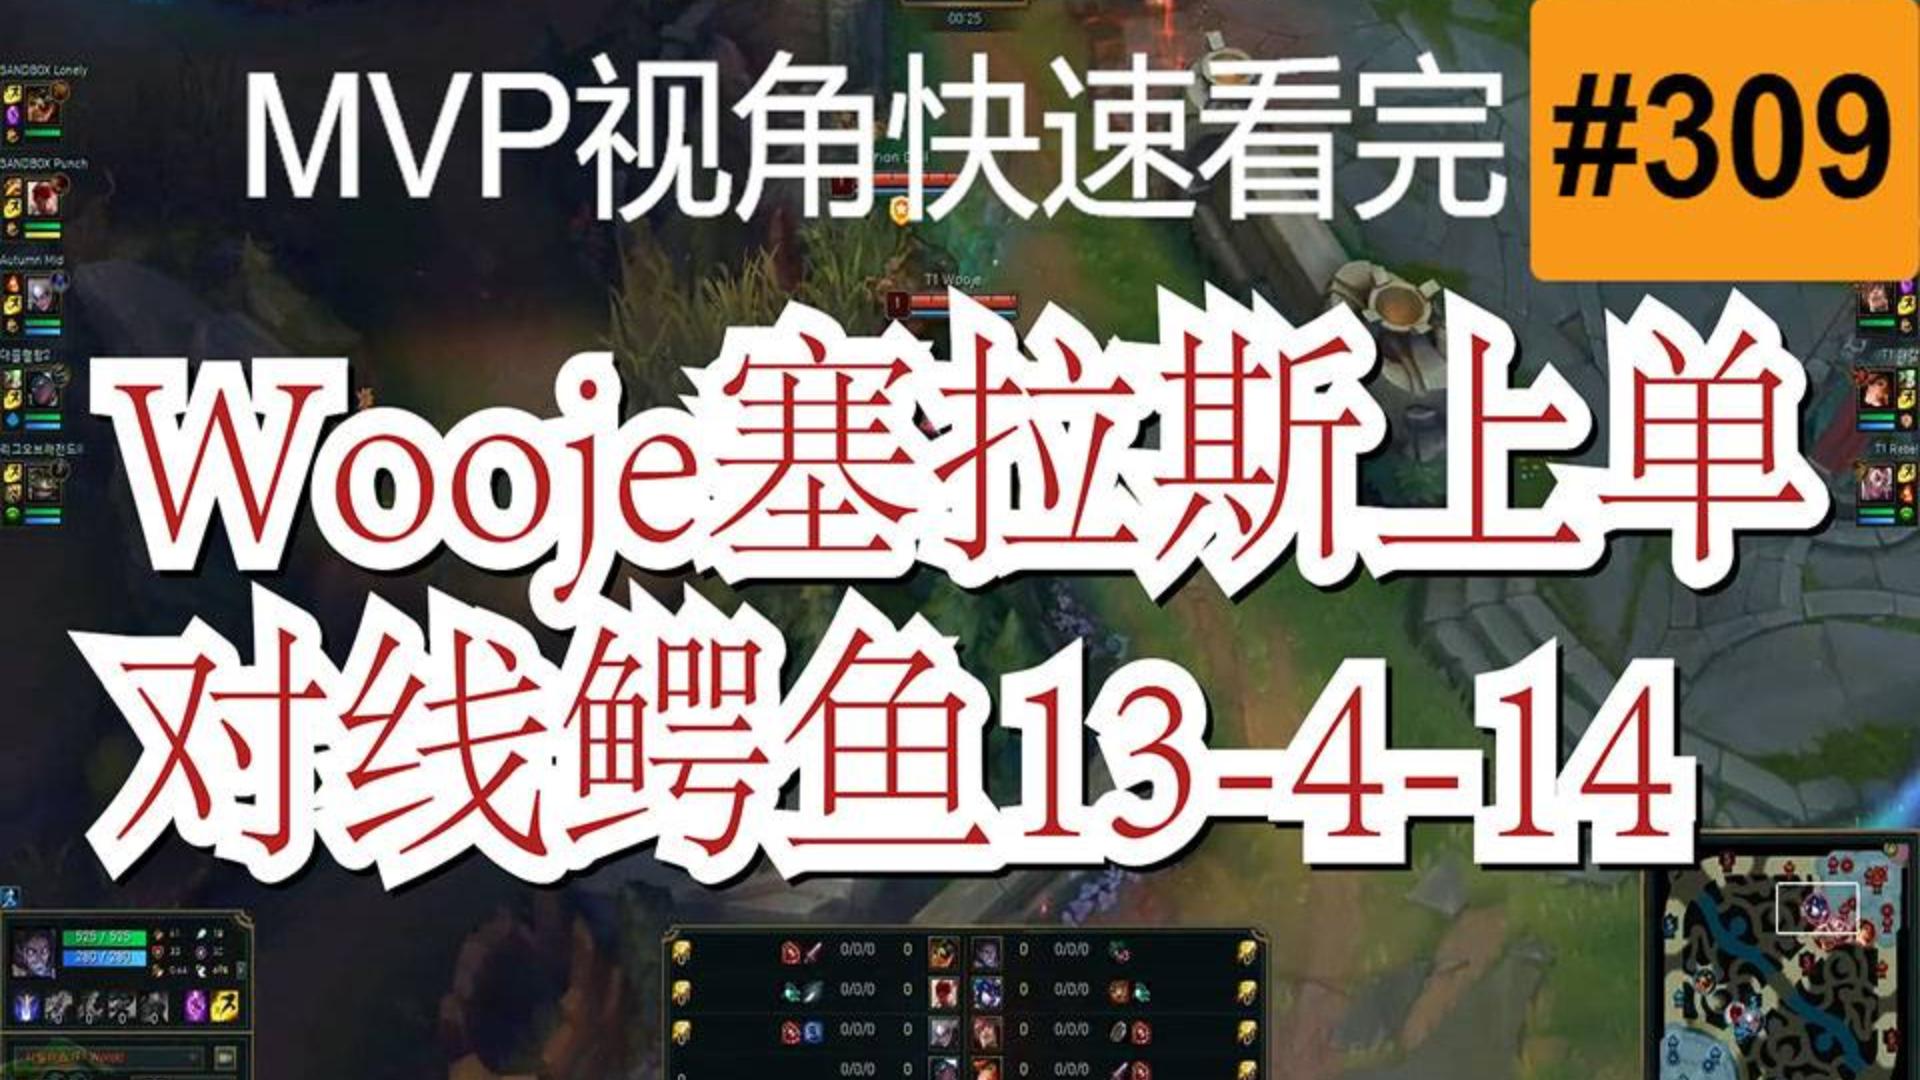 SKT.Wooje塞拉斯上单对线鳄鱼【MVP视角快速看完一局王者排位】#309